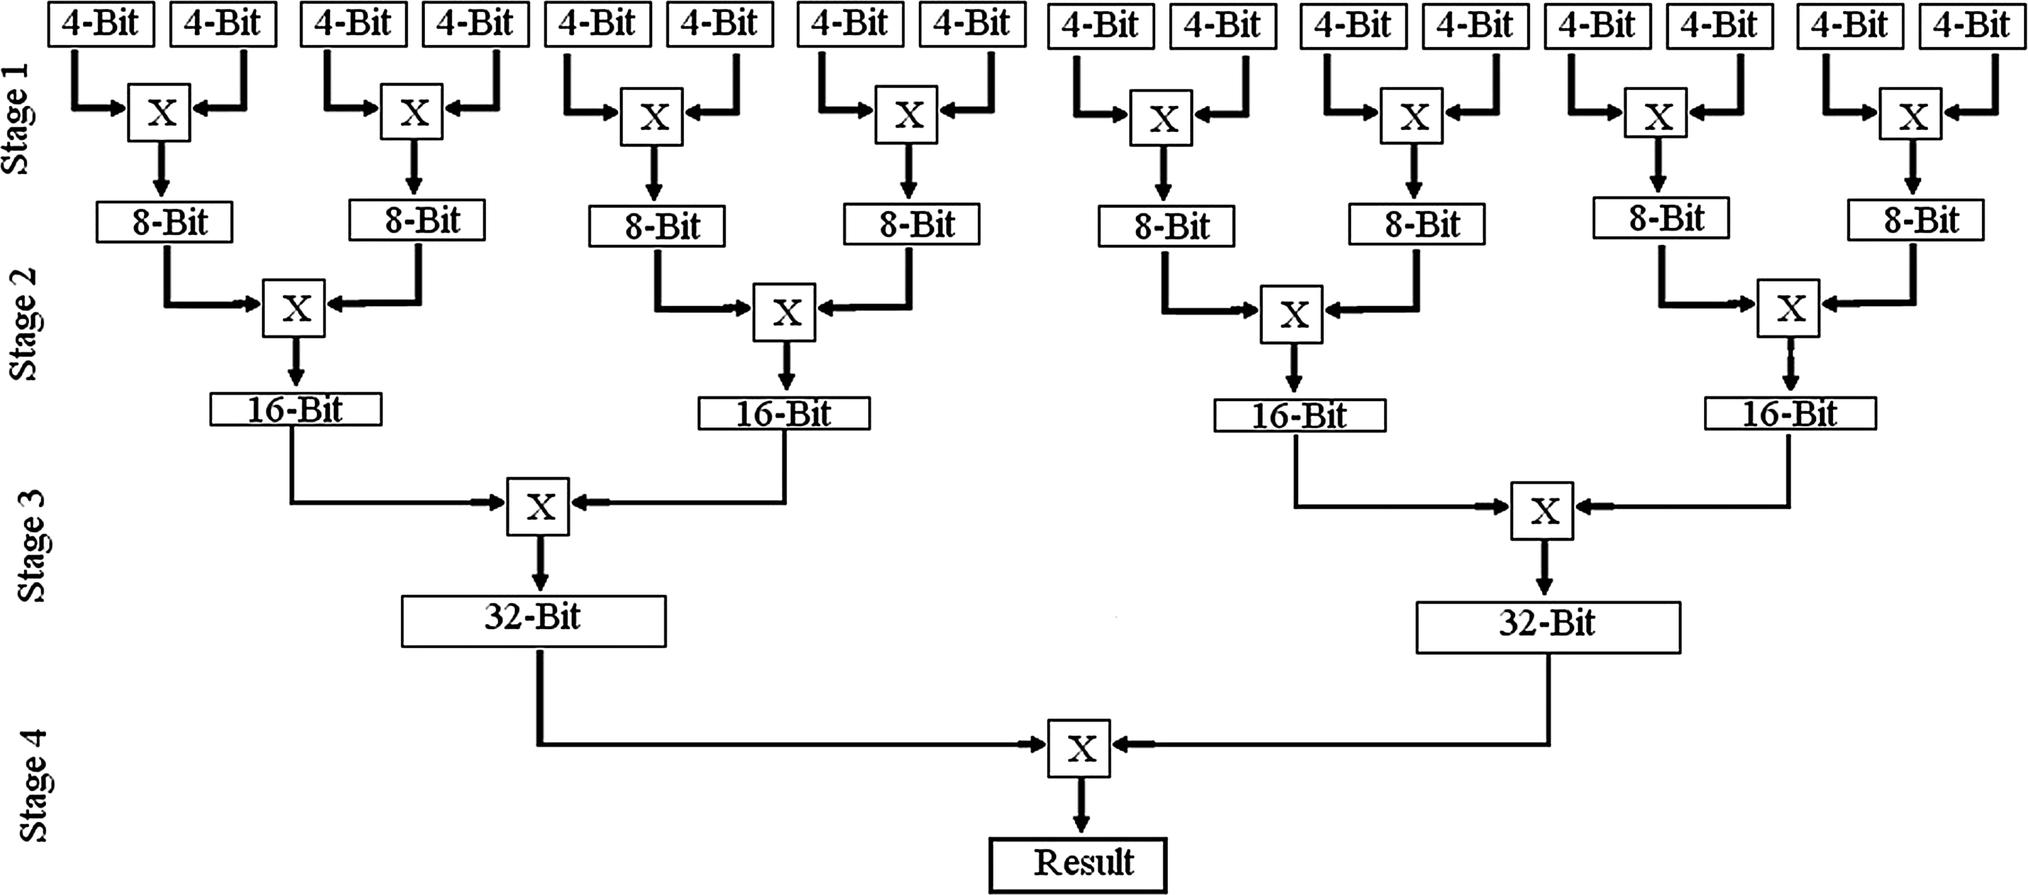 Low Power Binomial Coefficient Architecture For Unused Spectrum Logic Diagram 4 Bit Comparator Open Image In New Window